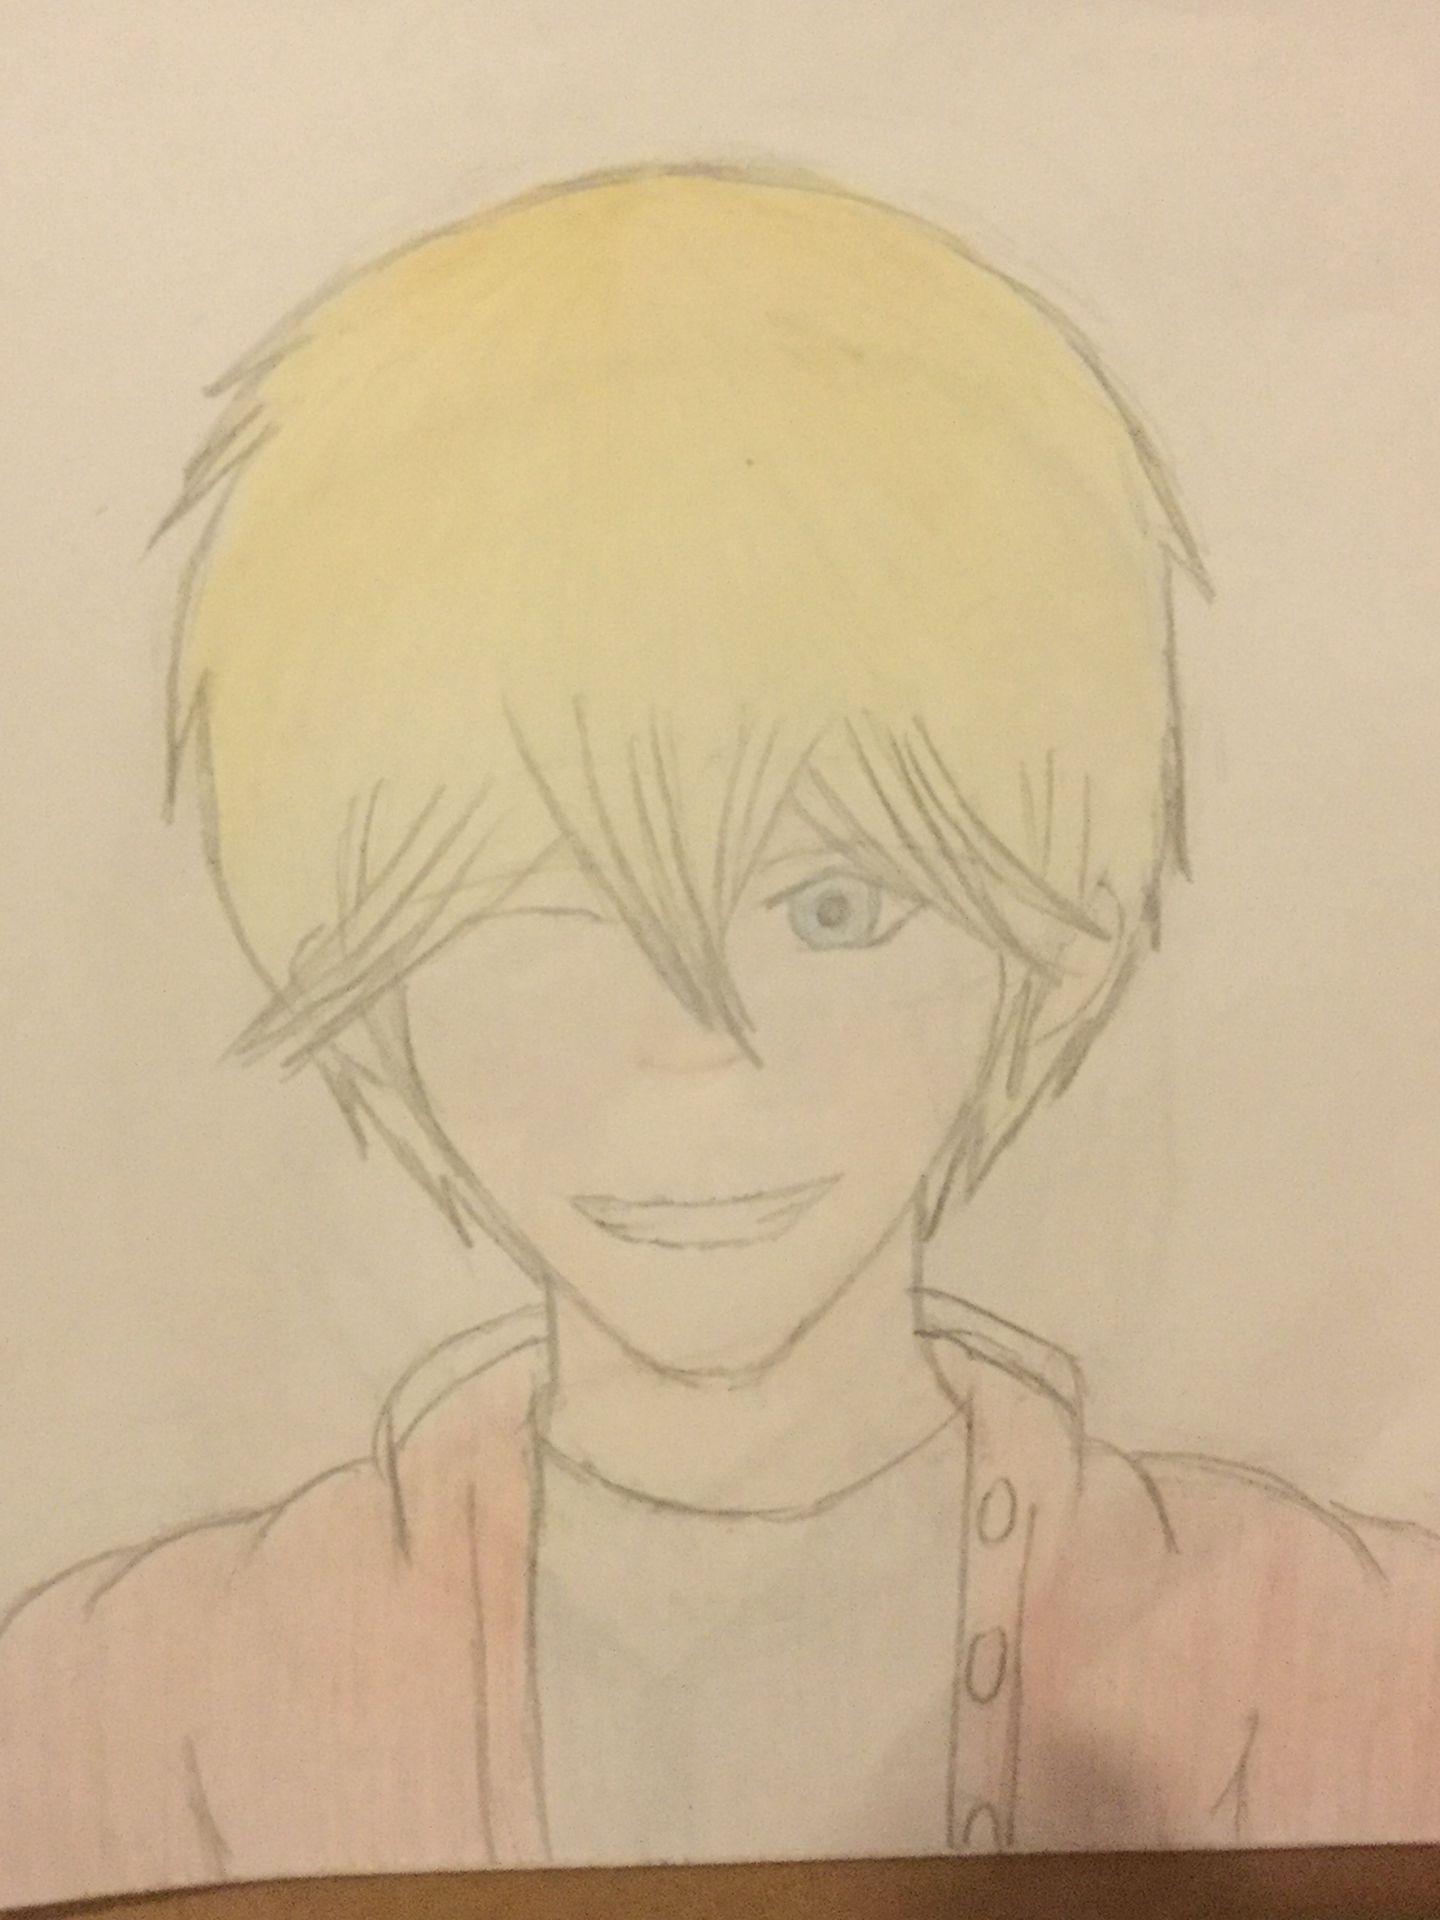 Name: Ryo WatariGender: MaleAge: 16Height: 174 cm